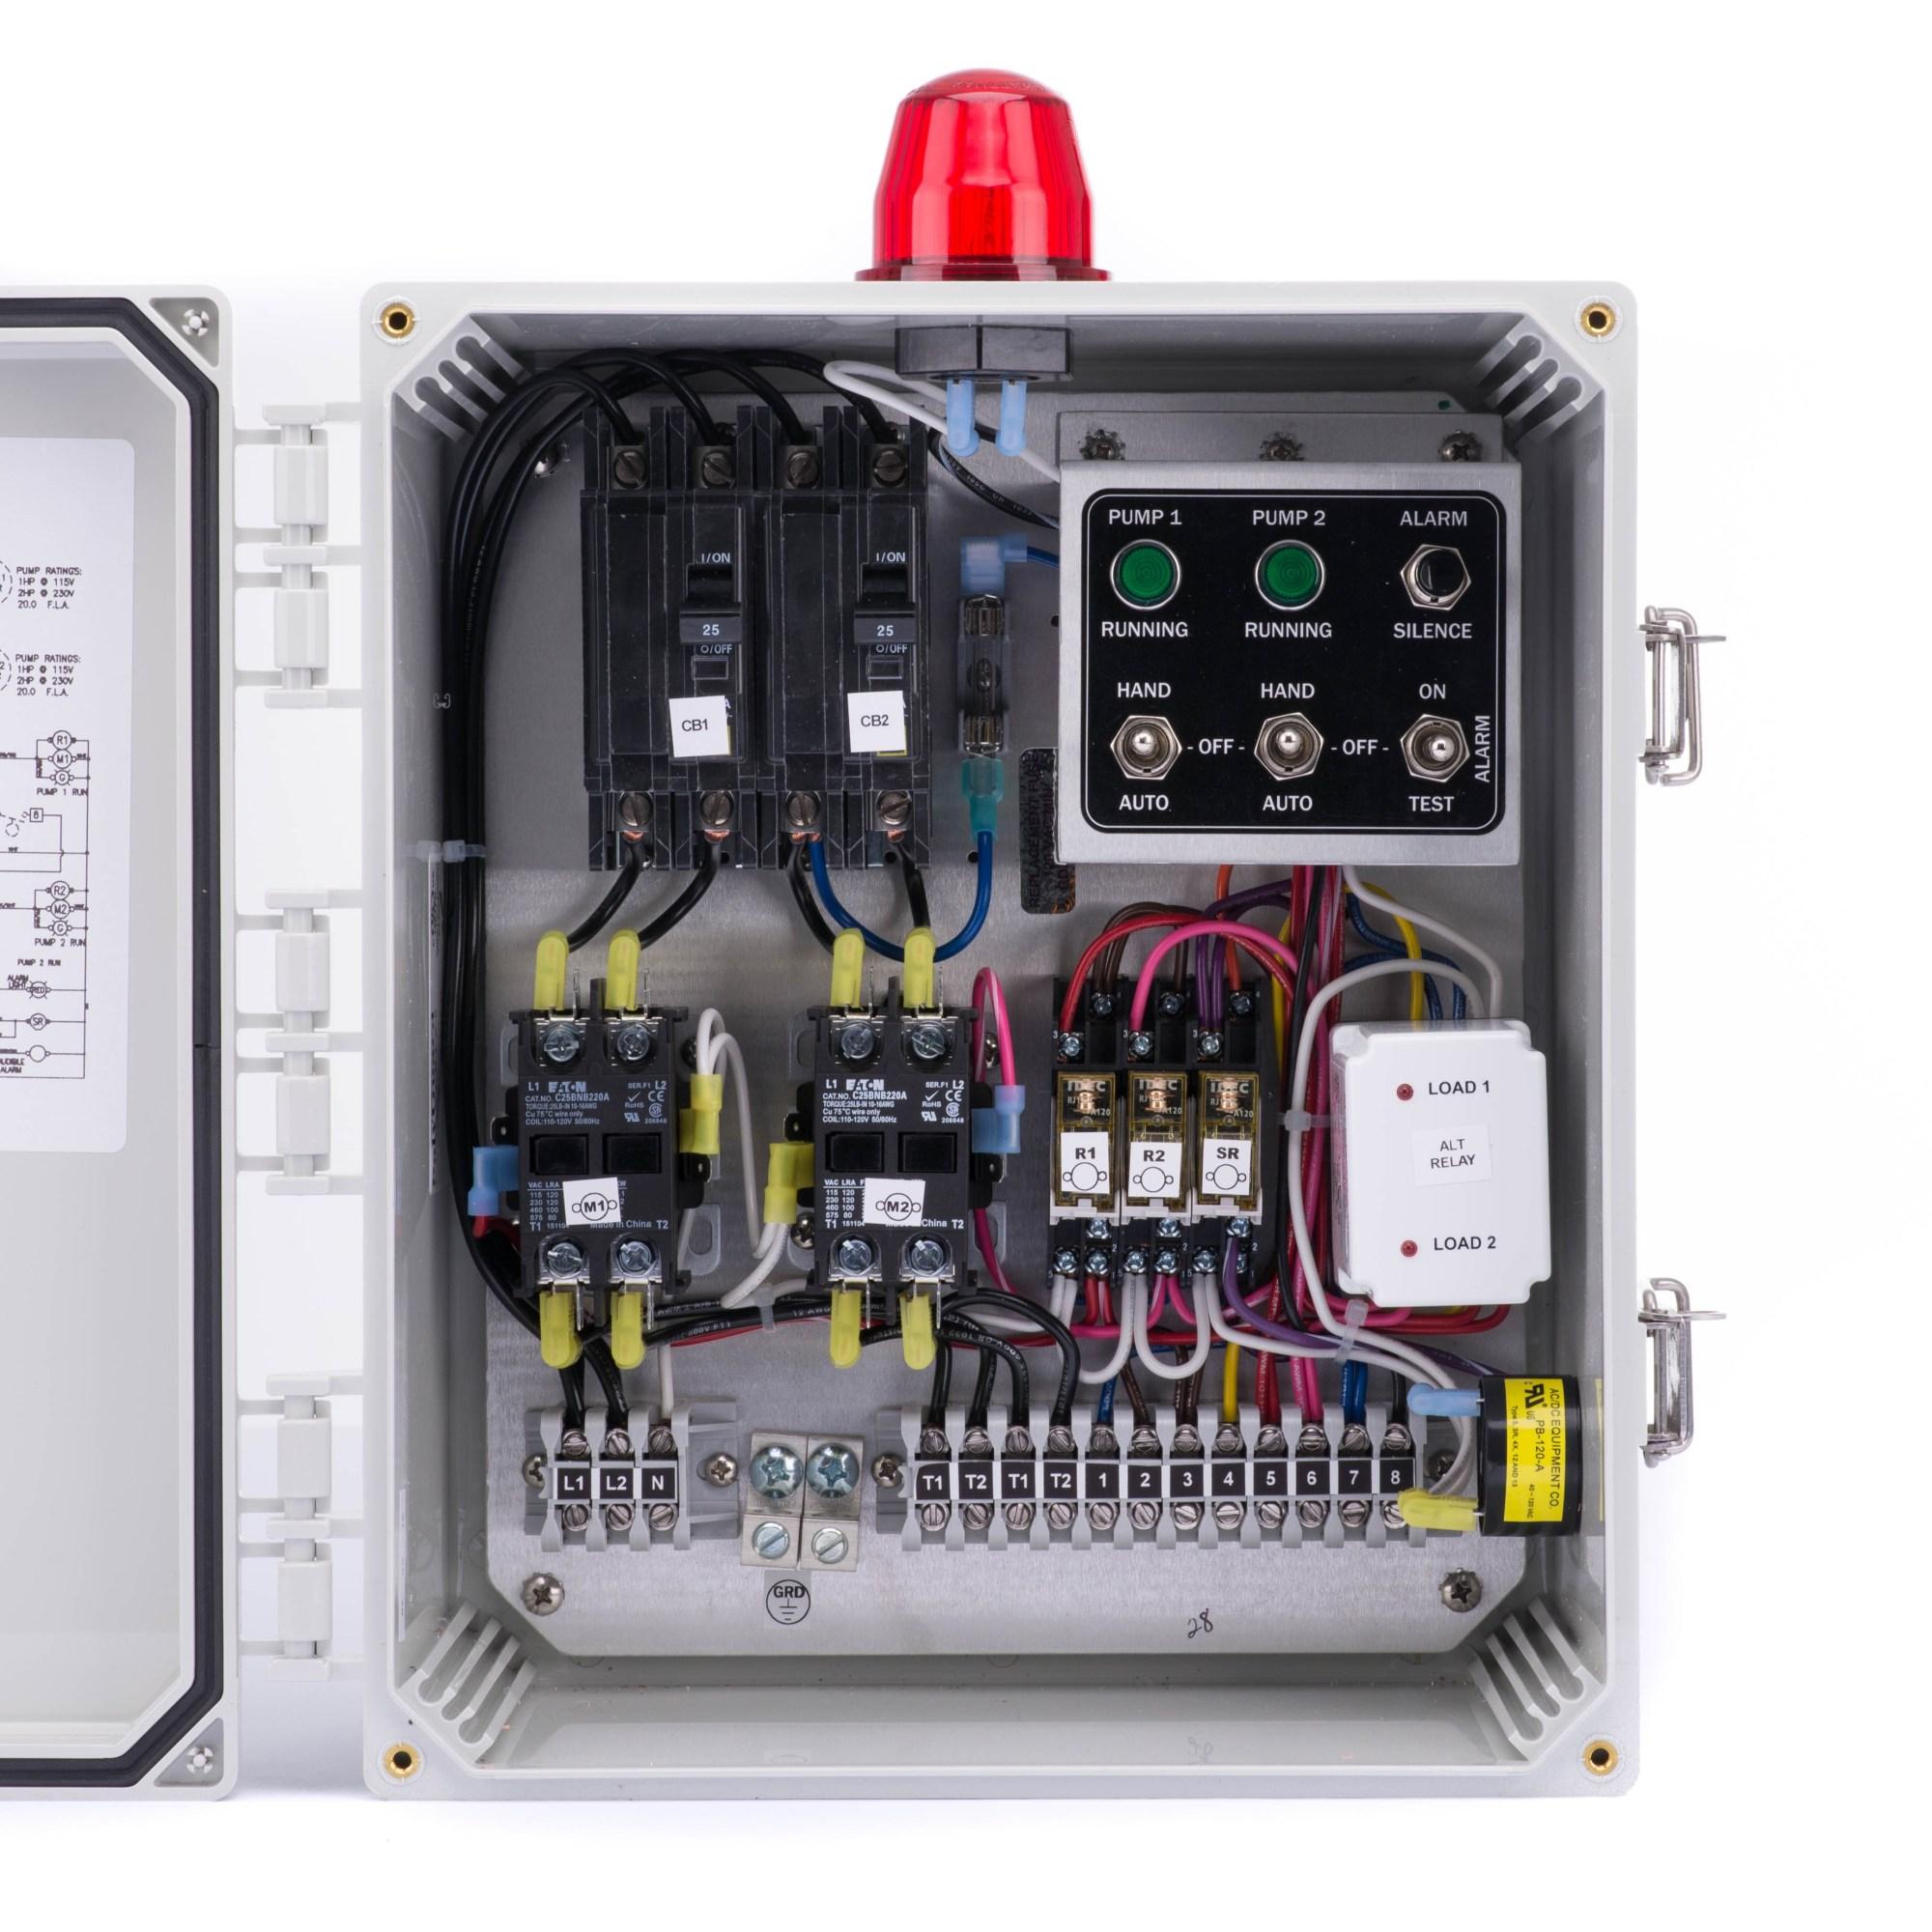 hight resolution of spi duplex control panel model ssc12b 120 240v 0 20fla 50a506